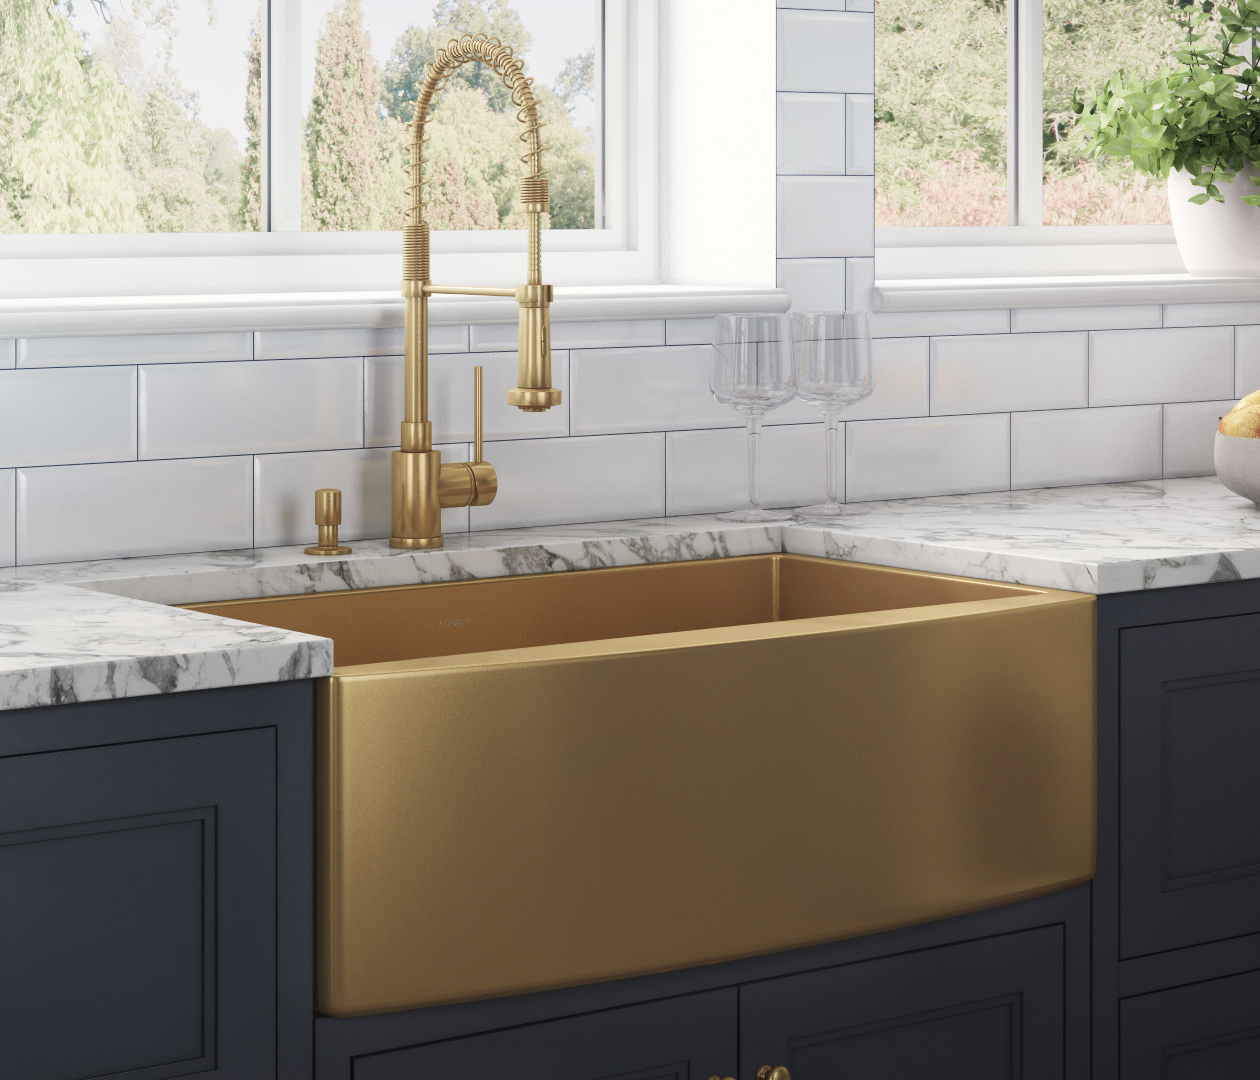 36 Inch Apron Front Farmhouse Kitchen Sink Brass Tone Matte Gold Stainless Steel Single Bowl Ruvati Usa